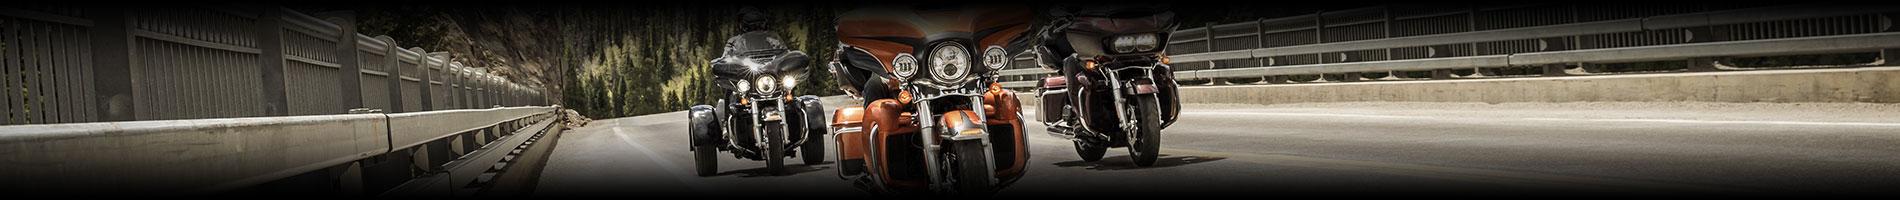 Tripps Harley-Davidson T-Shirts